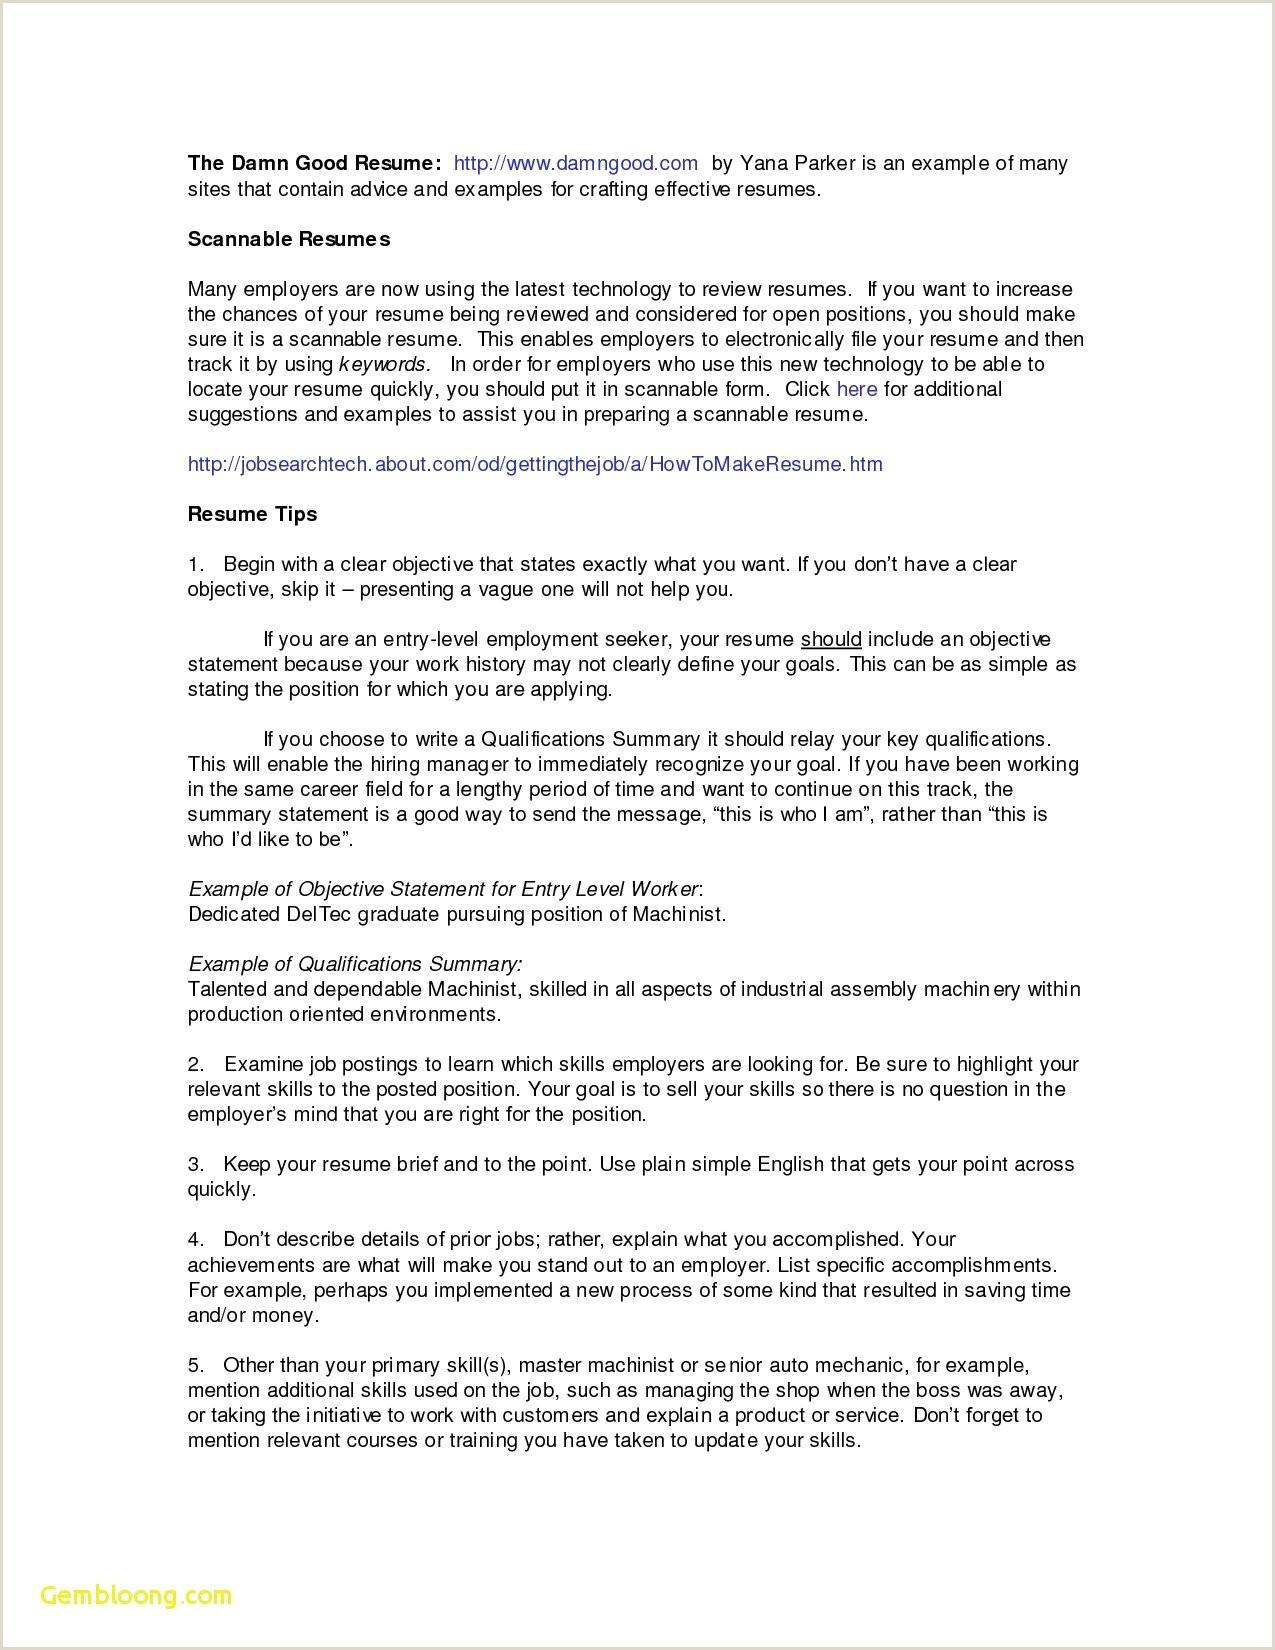 Data Analyst Resume Samples New 8 Entry Level Data Analyst